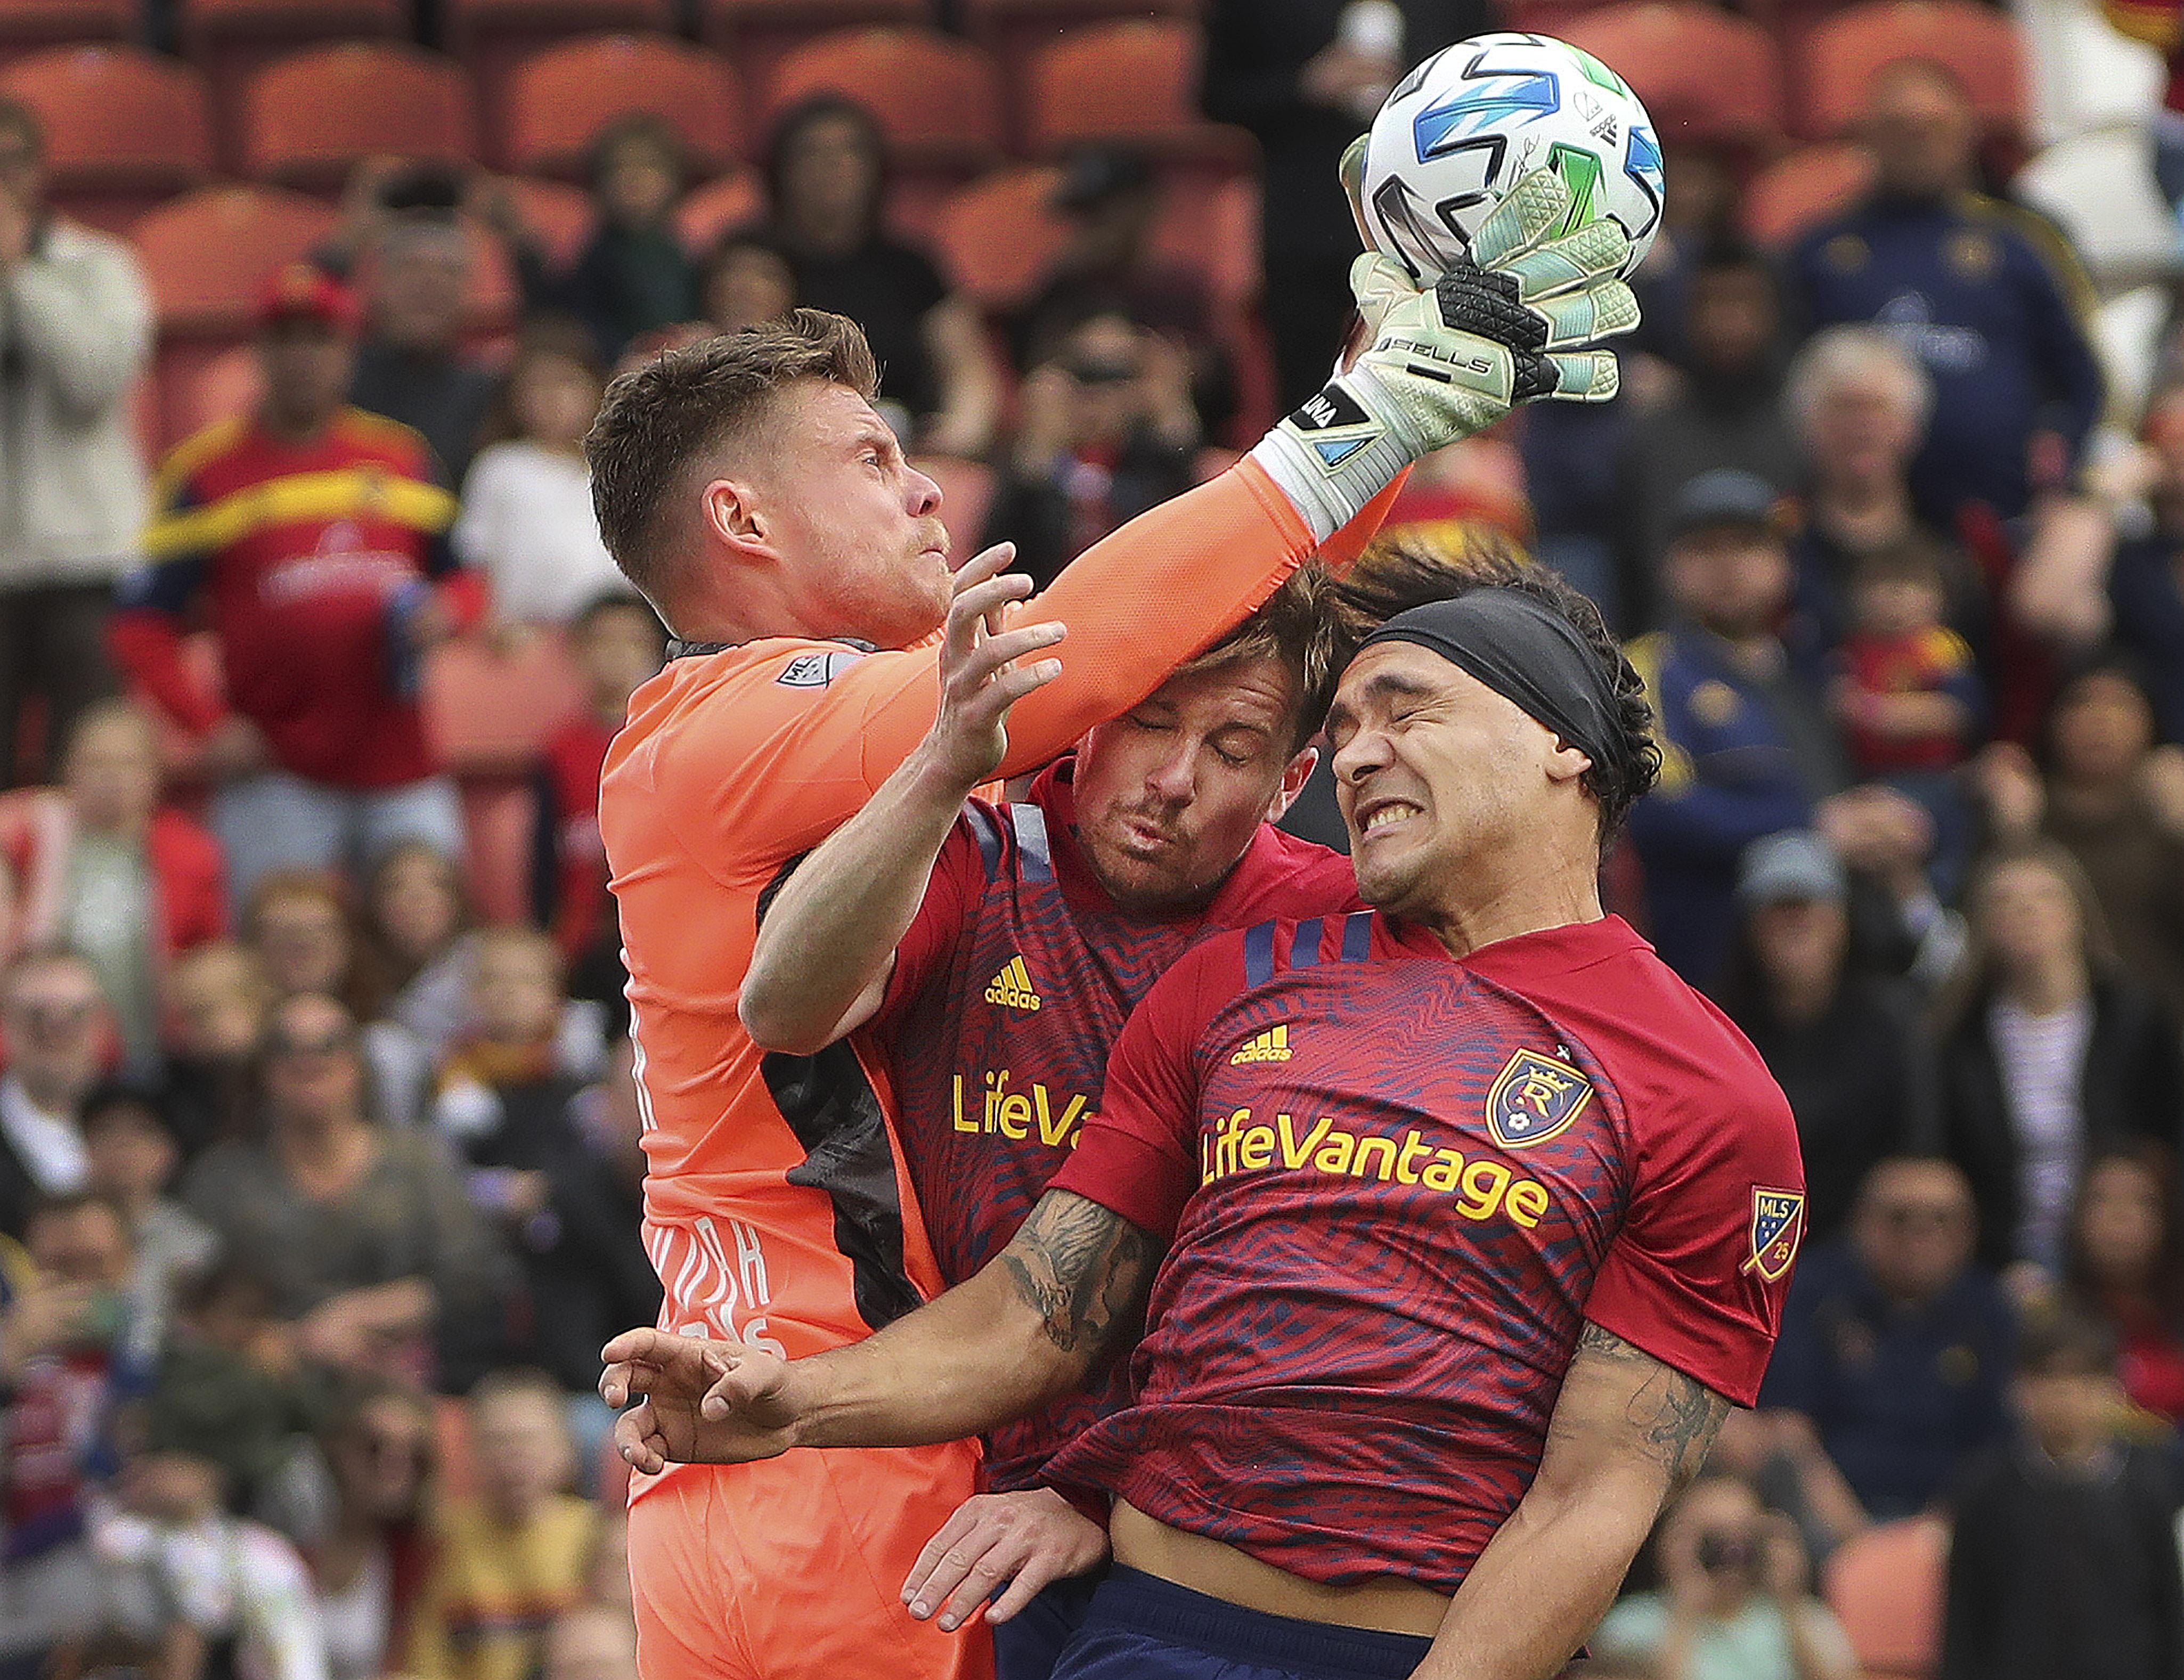 Real Salt Lake midfielder Nick Besler (13) and Real Salt Lake defender Marcelo Silva (30) try to head the ball as New York City goalkeeper David Jensen (1) grabs it in Sandy on Saturday, March 7, 2020.